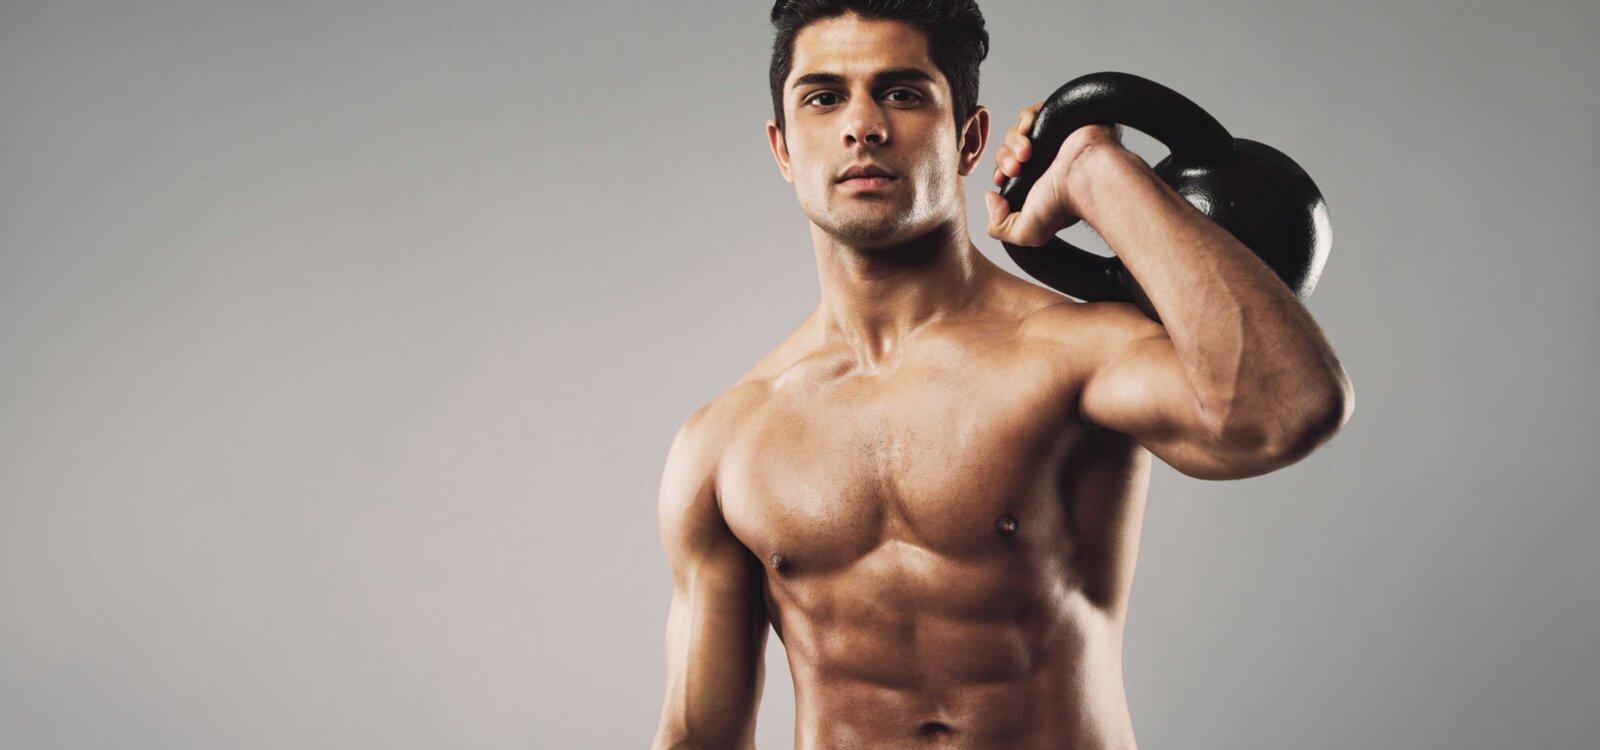 menno henselmans body fat percentage